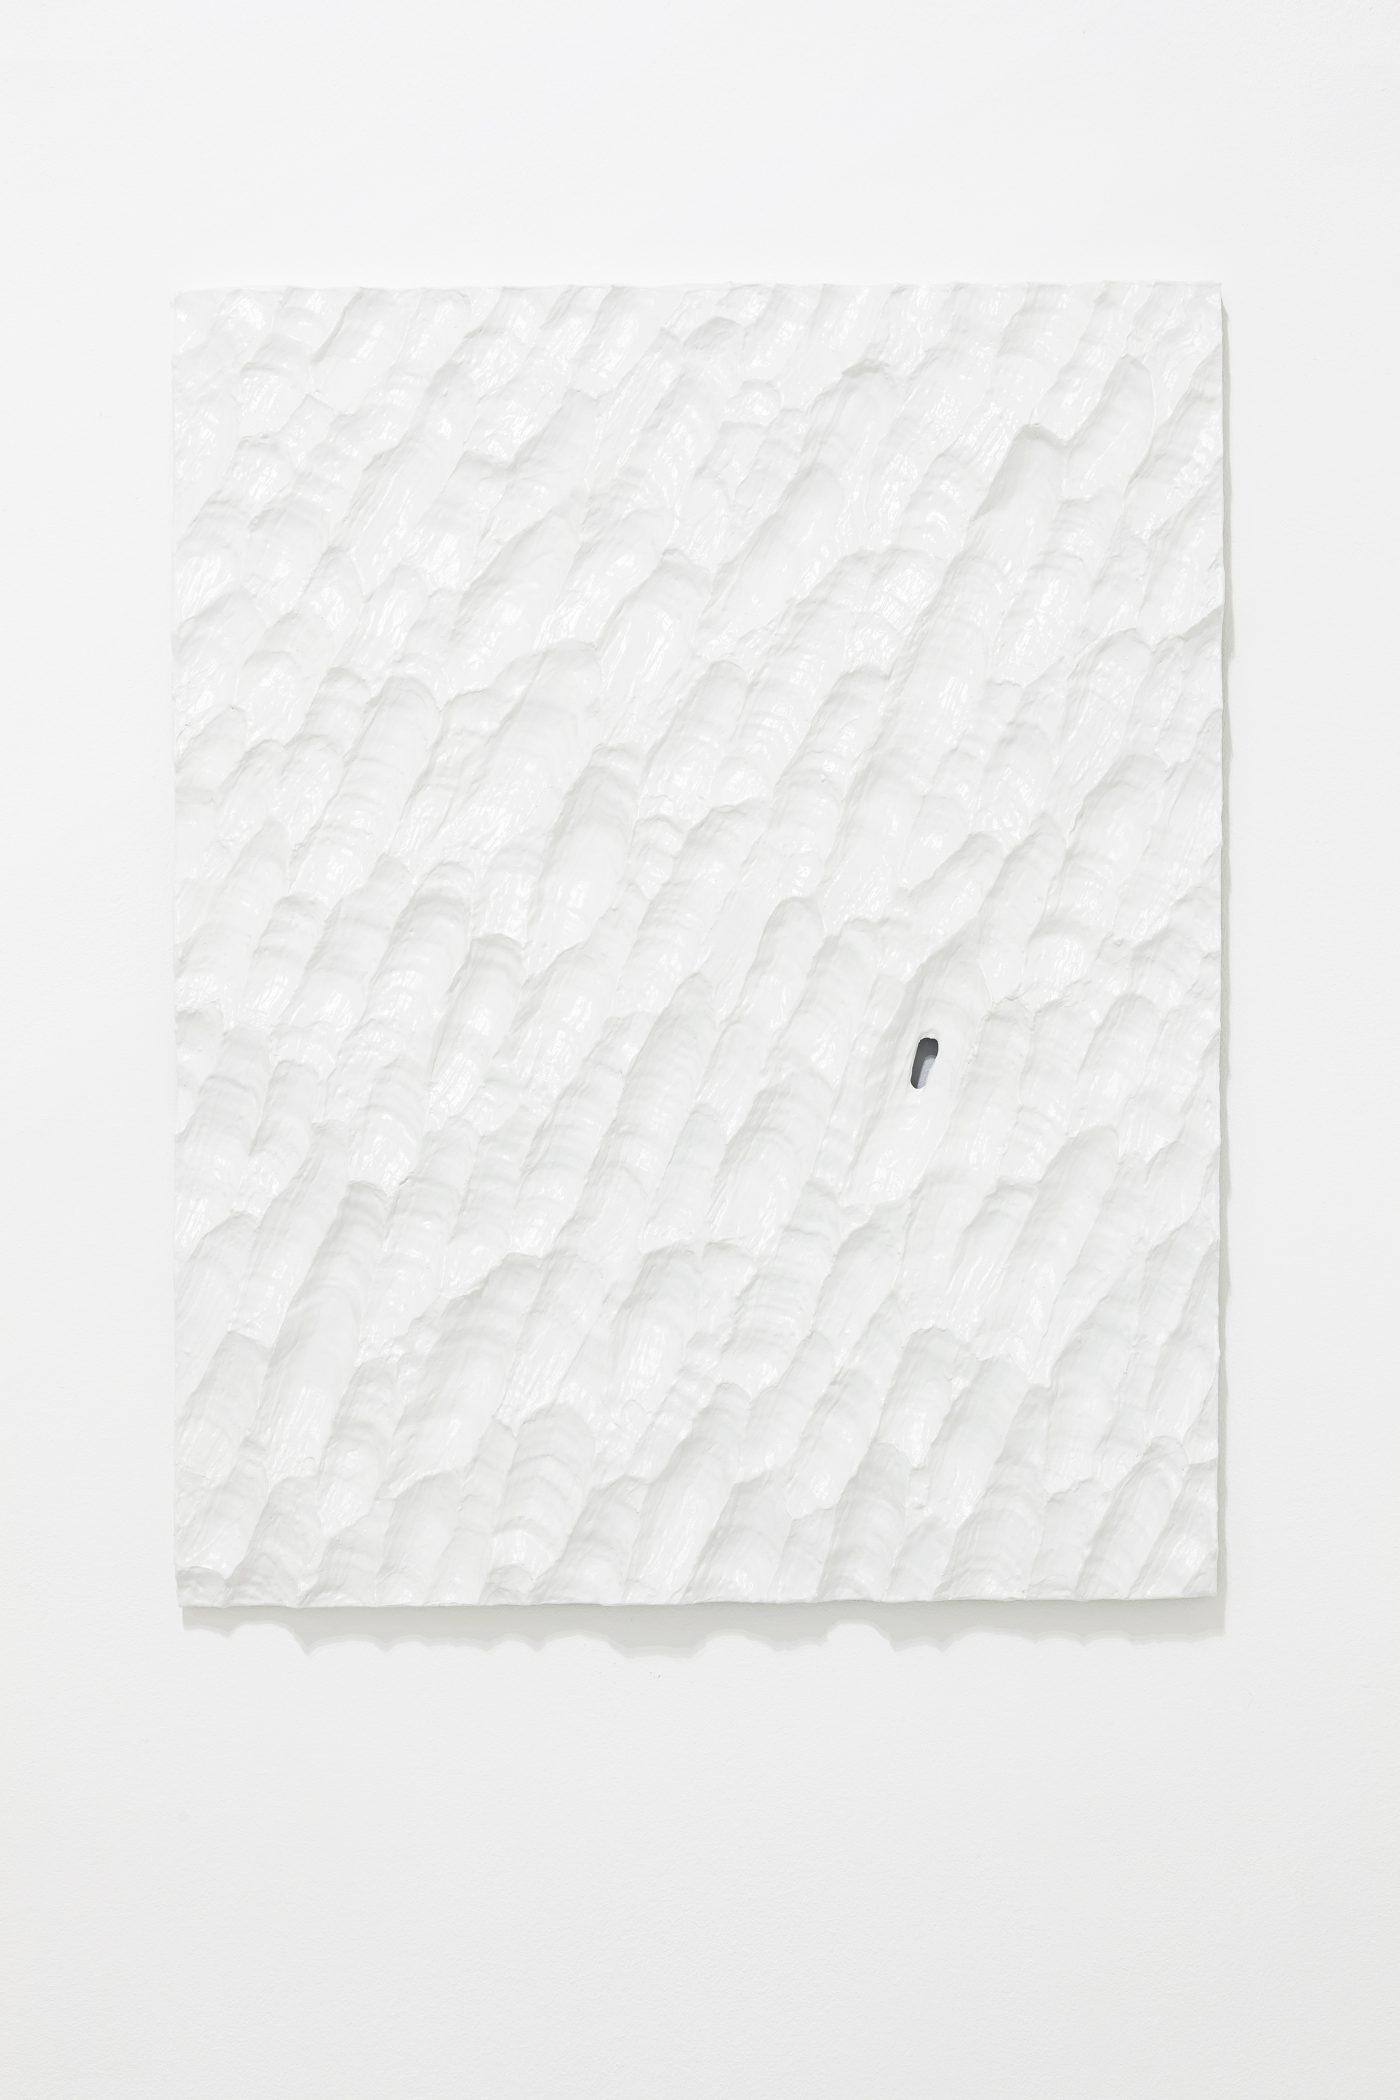 Galerie Lange + Pult – John Aaron Frank